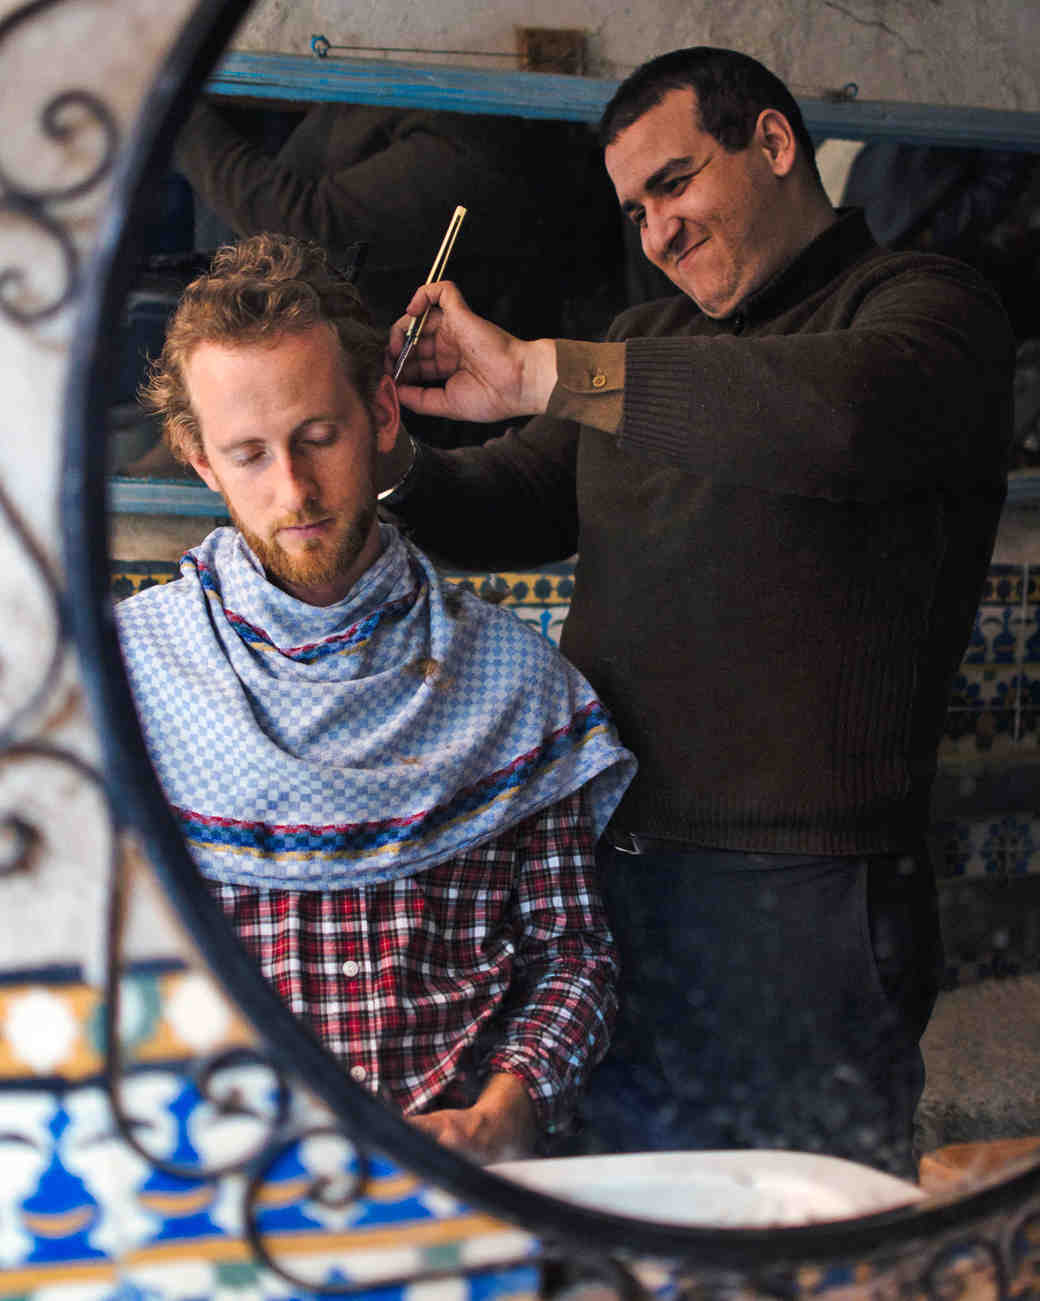 morocco-honeymoon-haircut-marrakech-dsc0989-0914.jpg